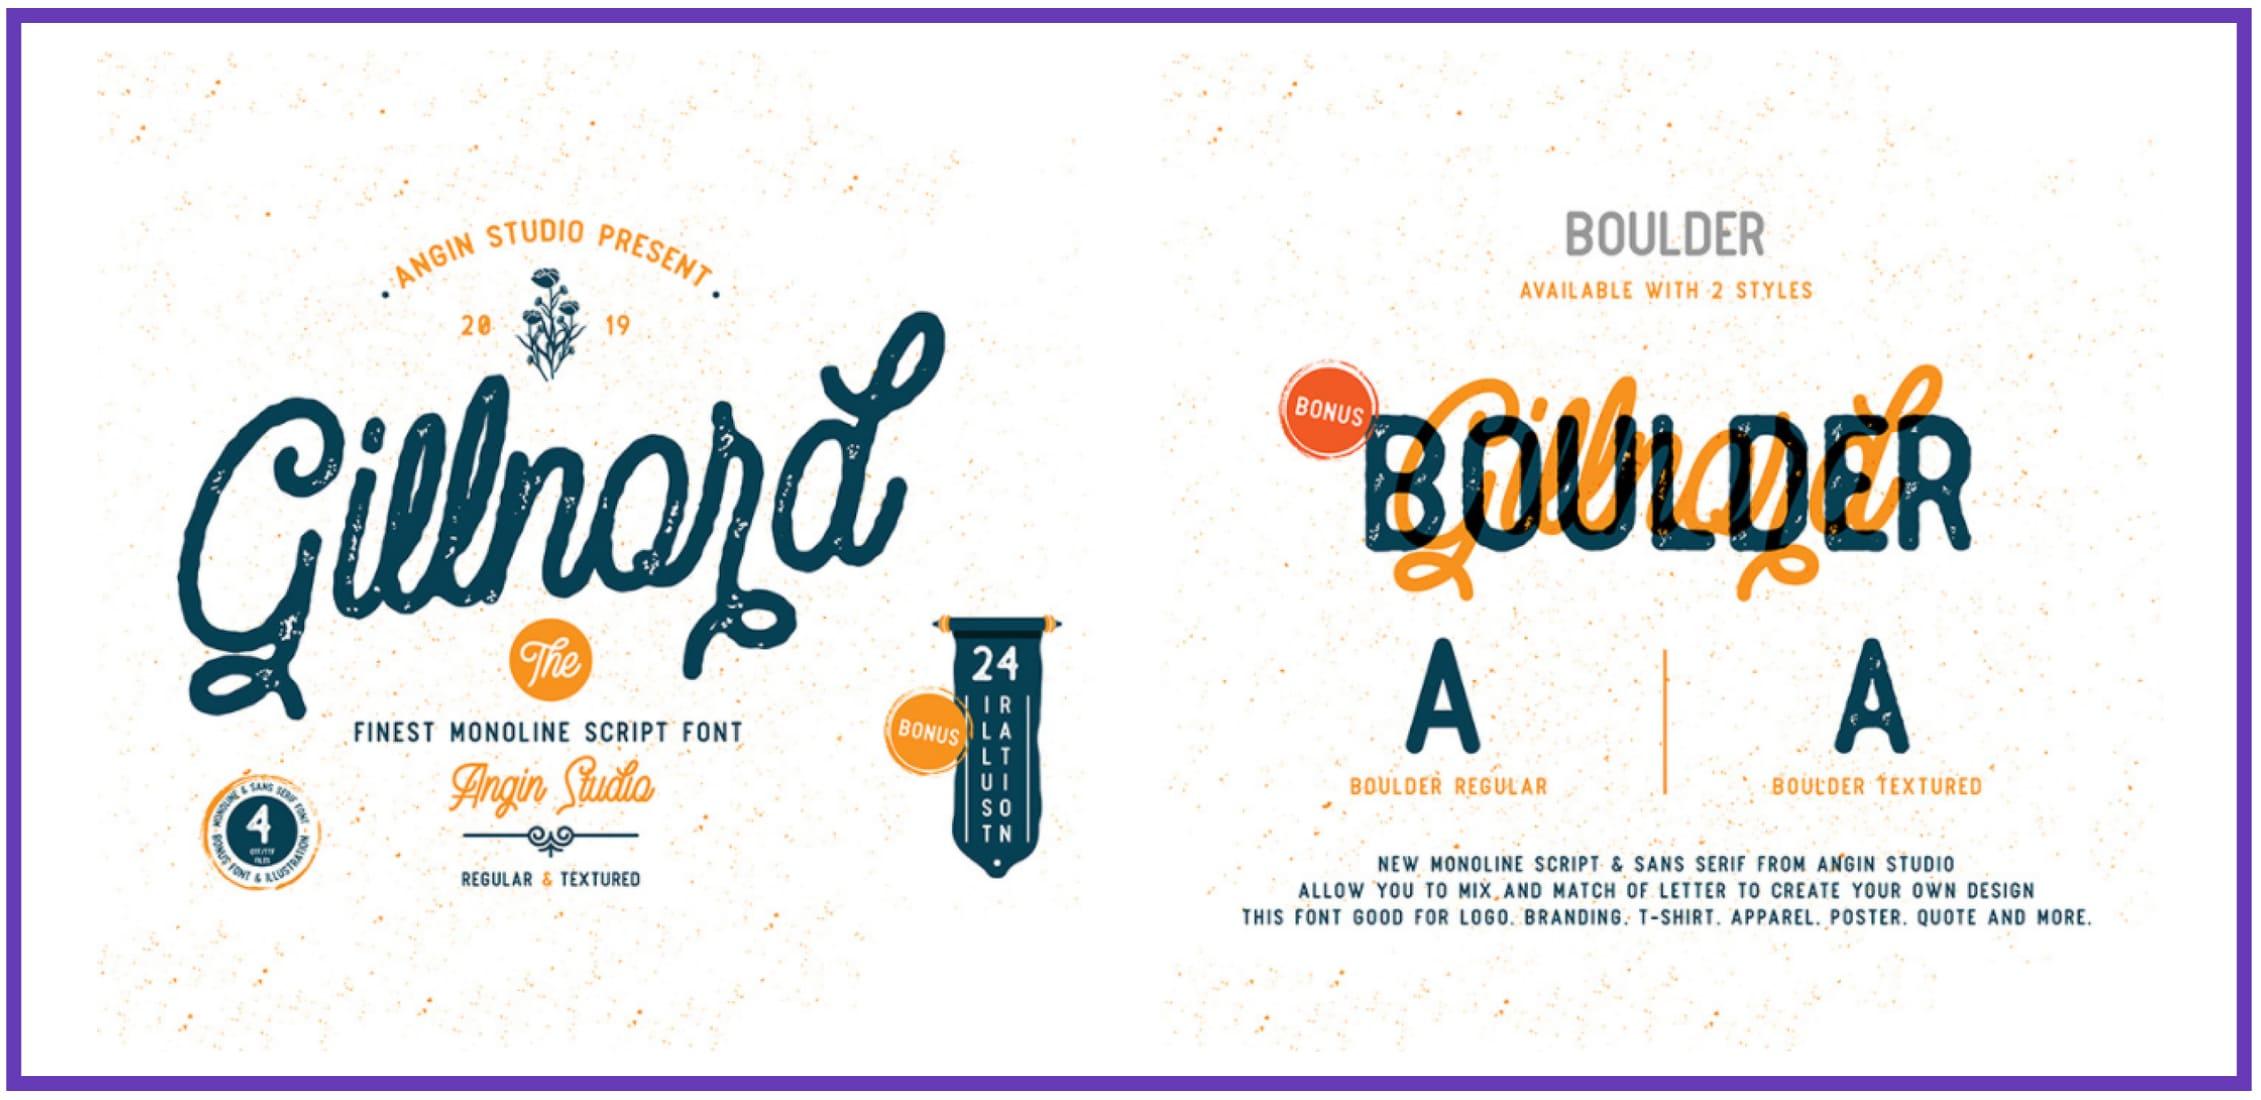 Vintage Monoline Font: Gillnord Script (4 Fonts with Extras). Best Industrial Fonts.